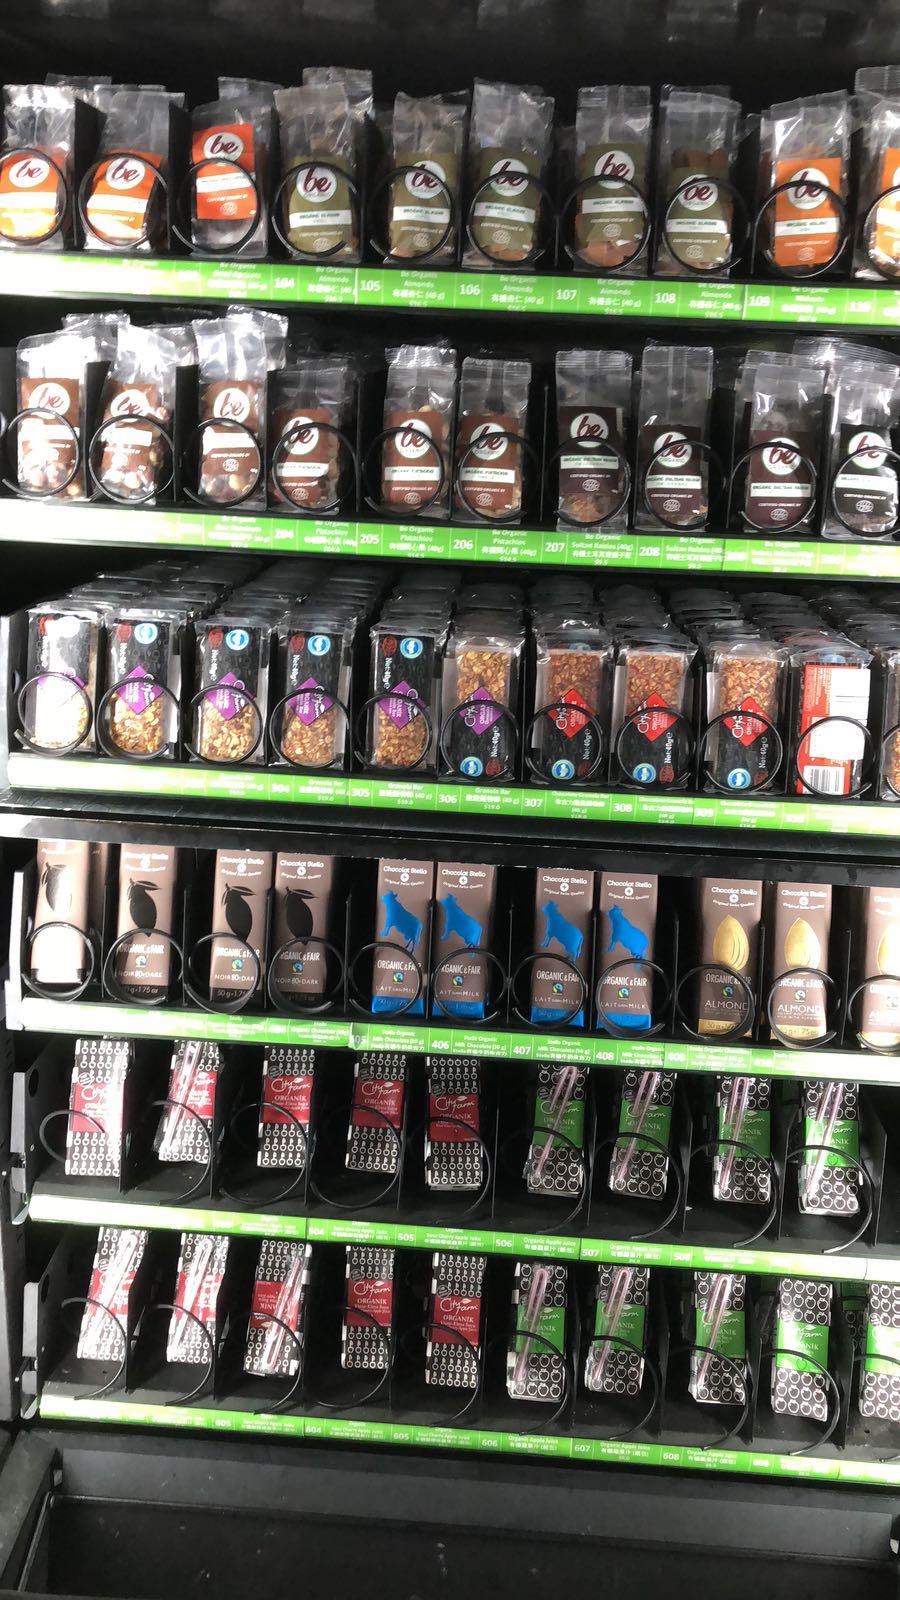 FreshUp,自動售賣機,自動販賣機,零食,飲品,方便,快捷,智能,企業,公司,信任,天星小輪